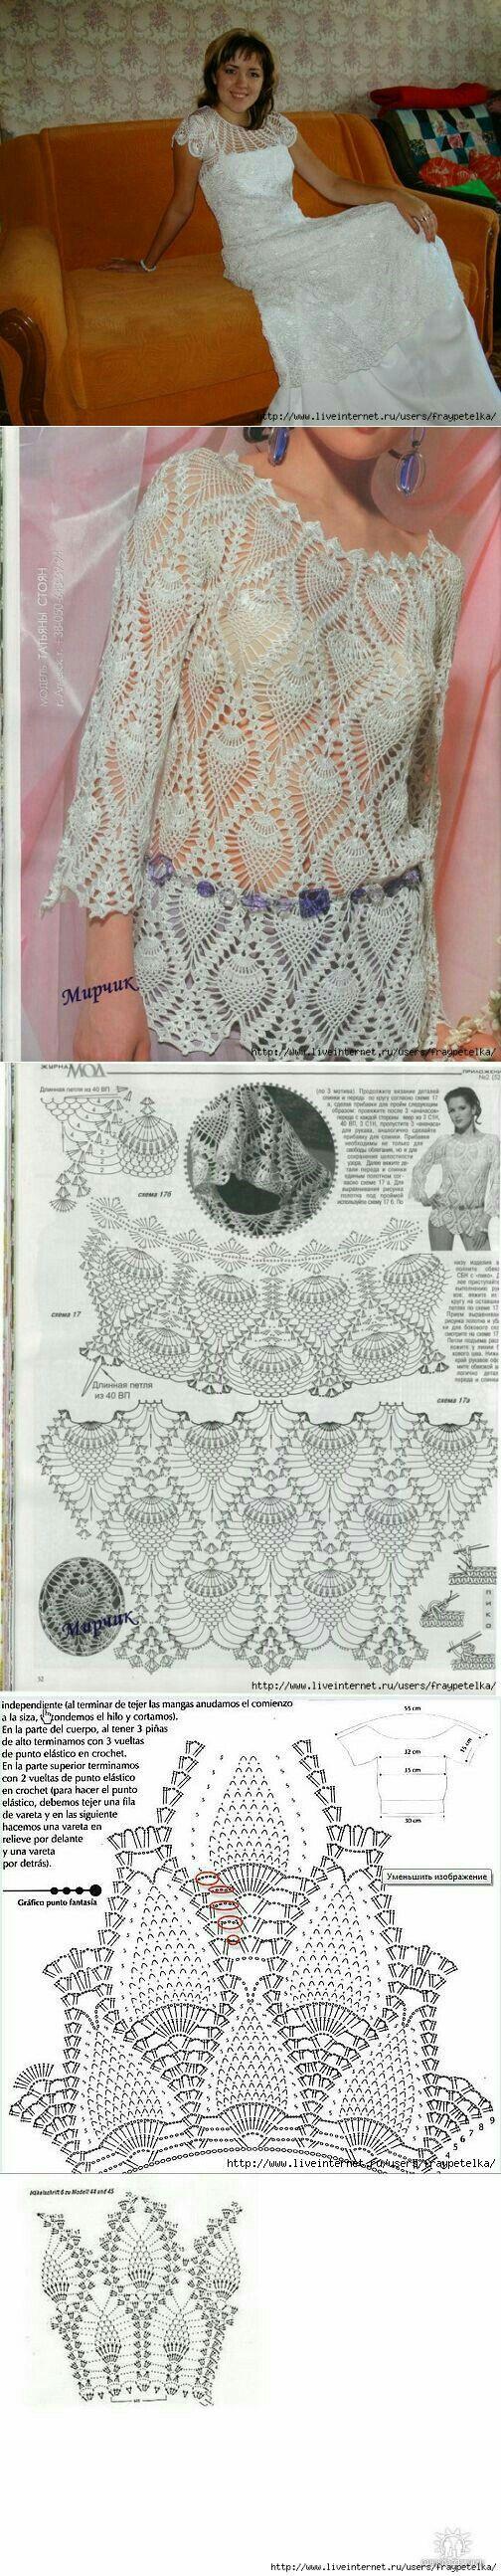 Pin de Rachel traore en crochet | Pinterest | Blusas, Blusas de ...